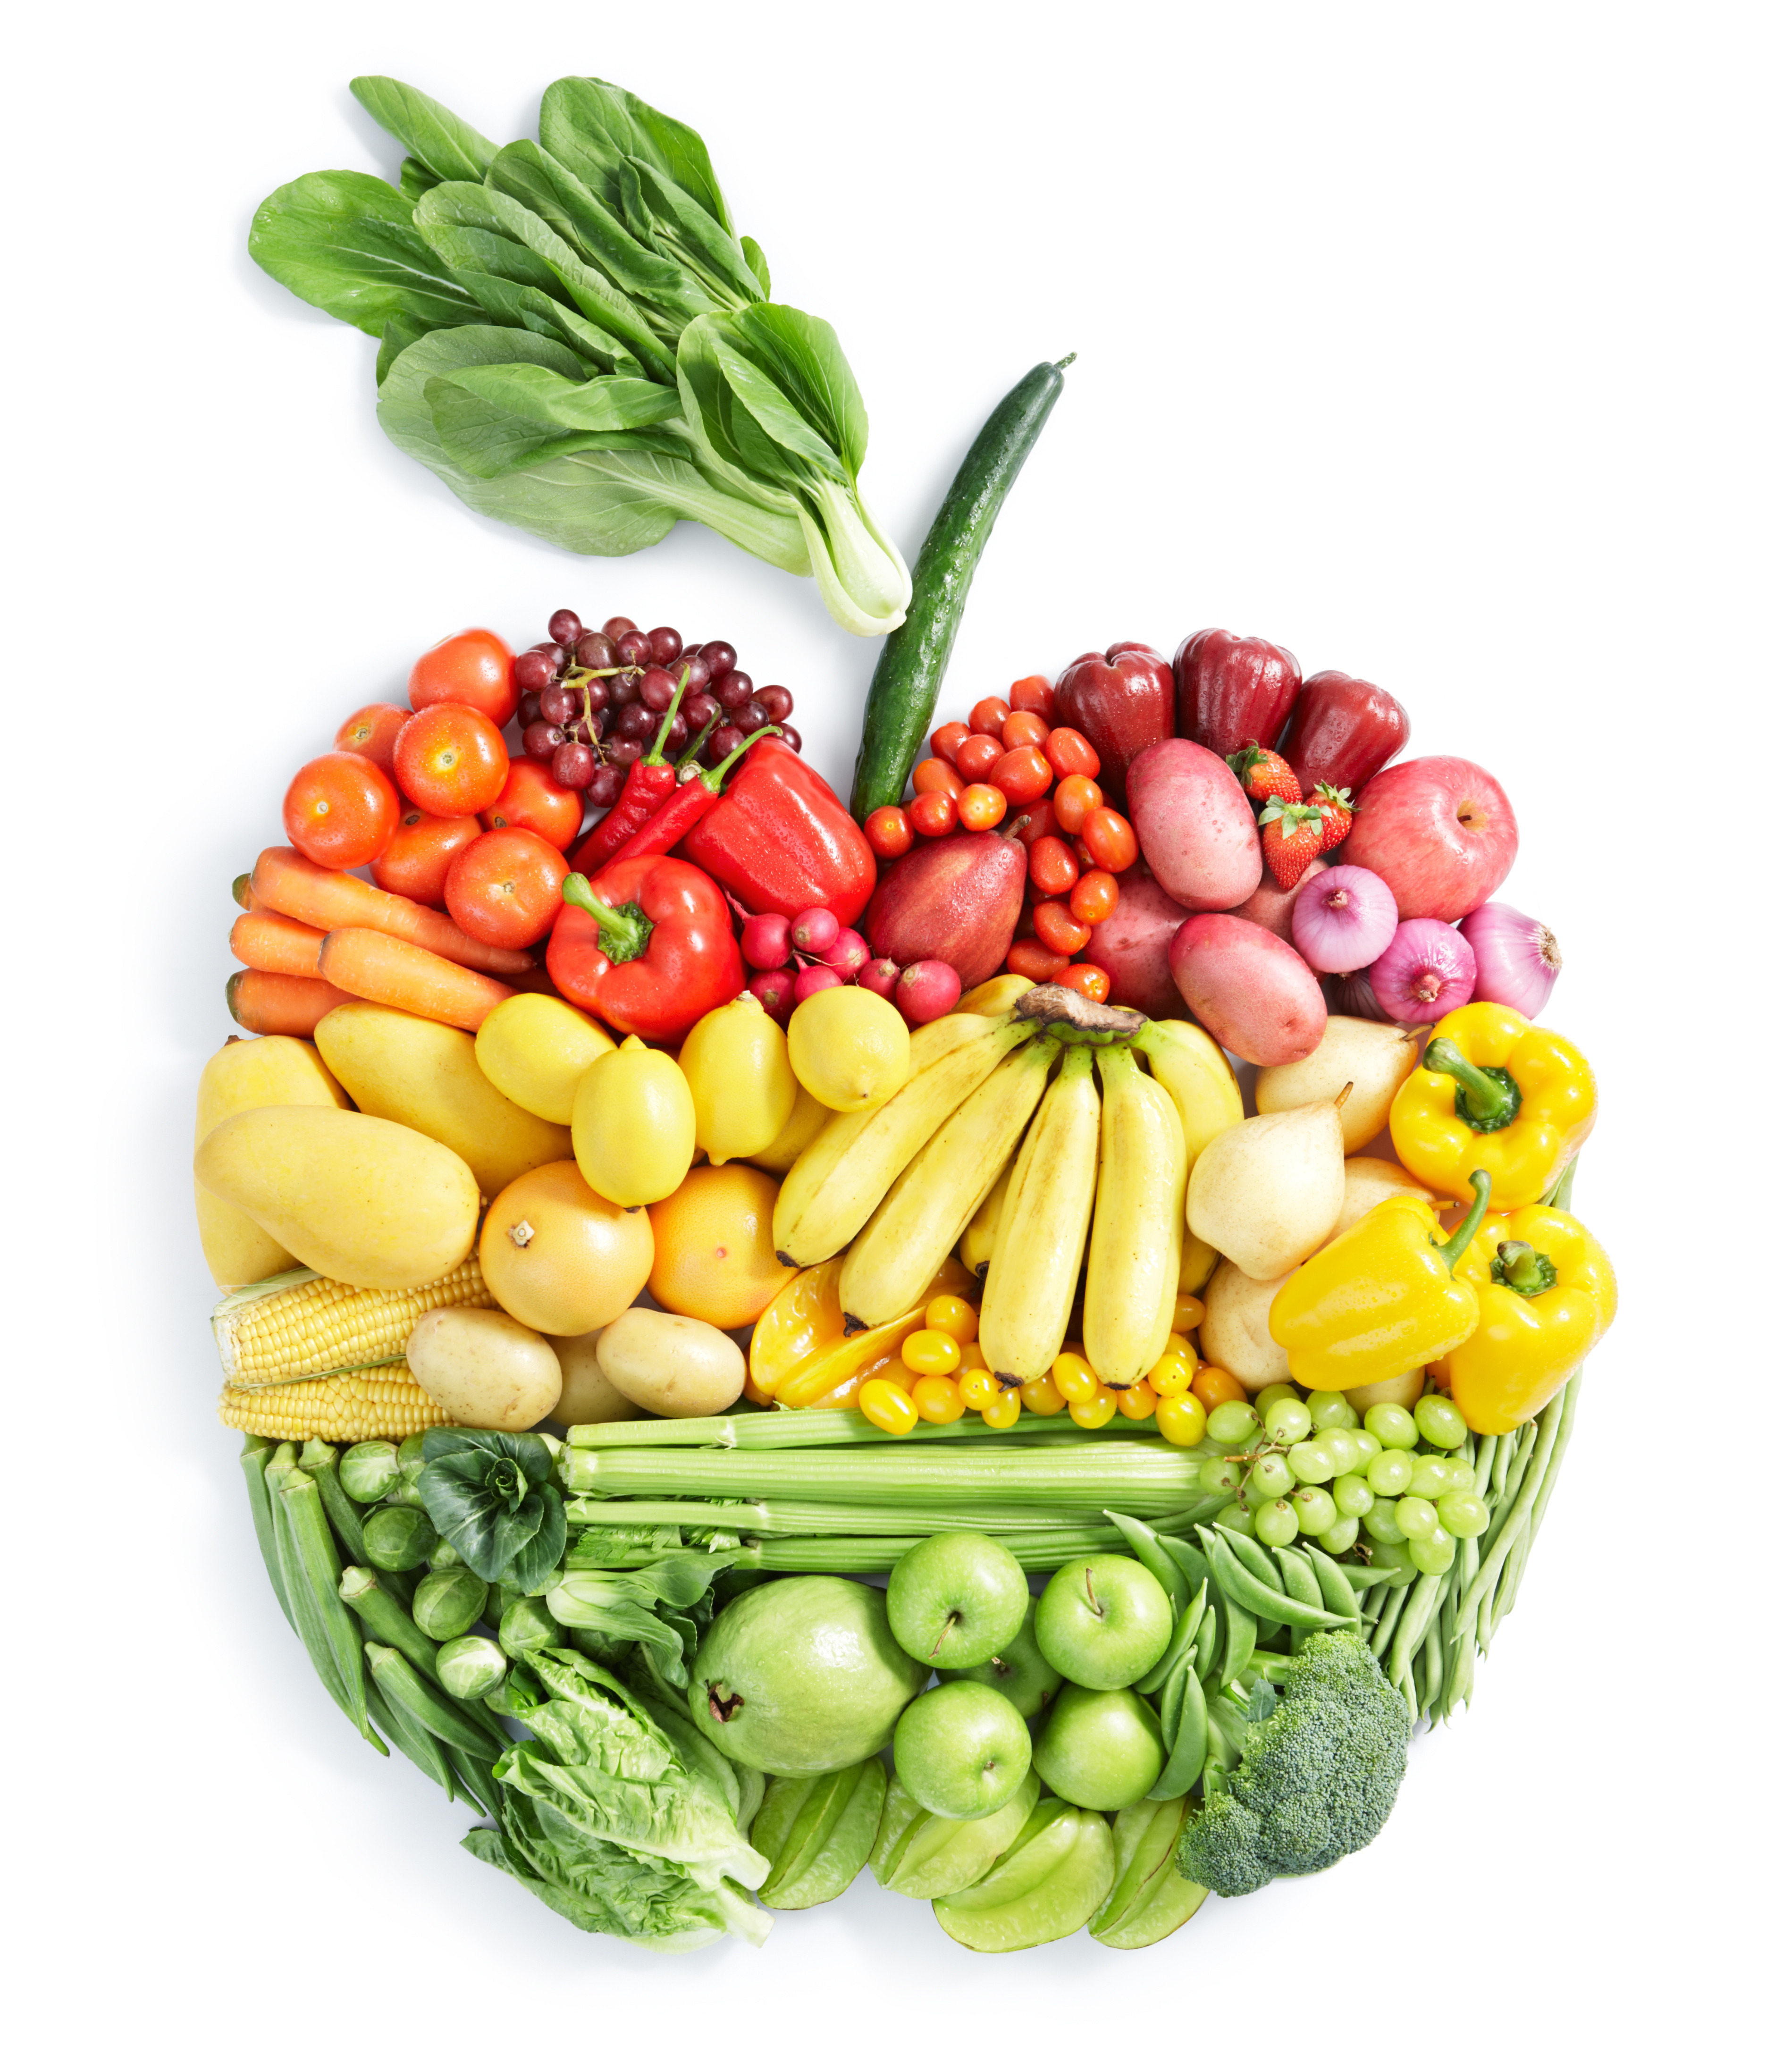 Nutrition_seminar_FruitVeggieApple_Fotosearch_k5734863